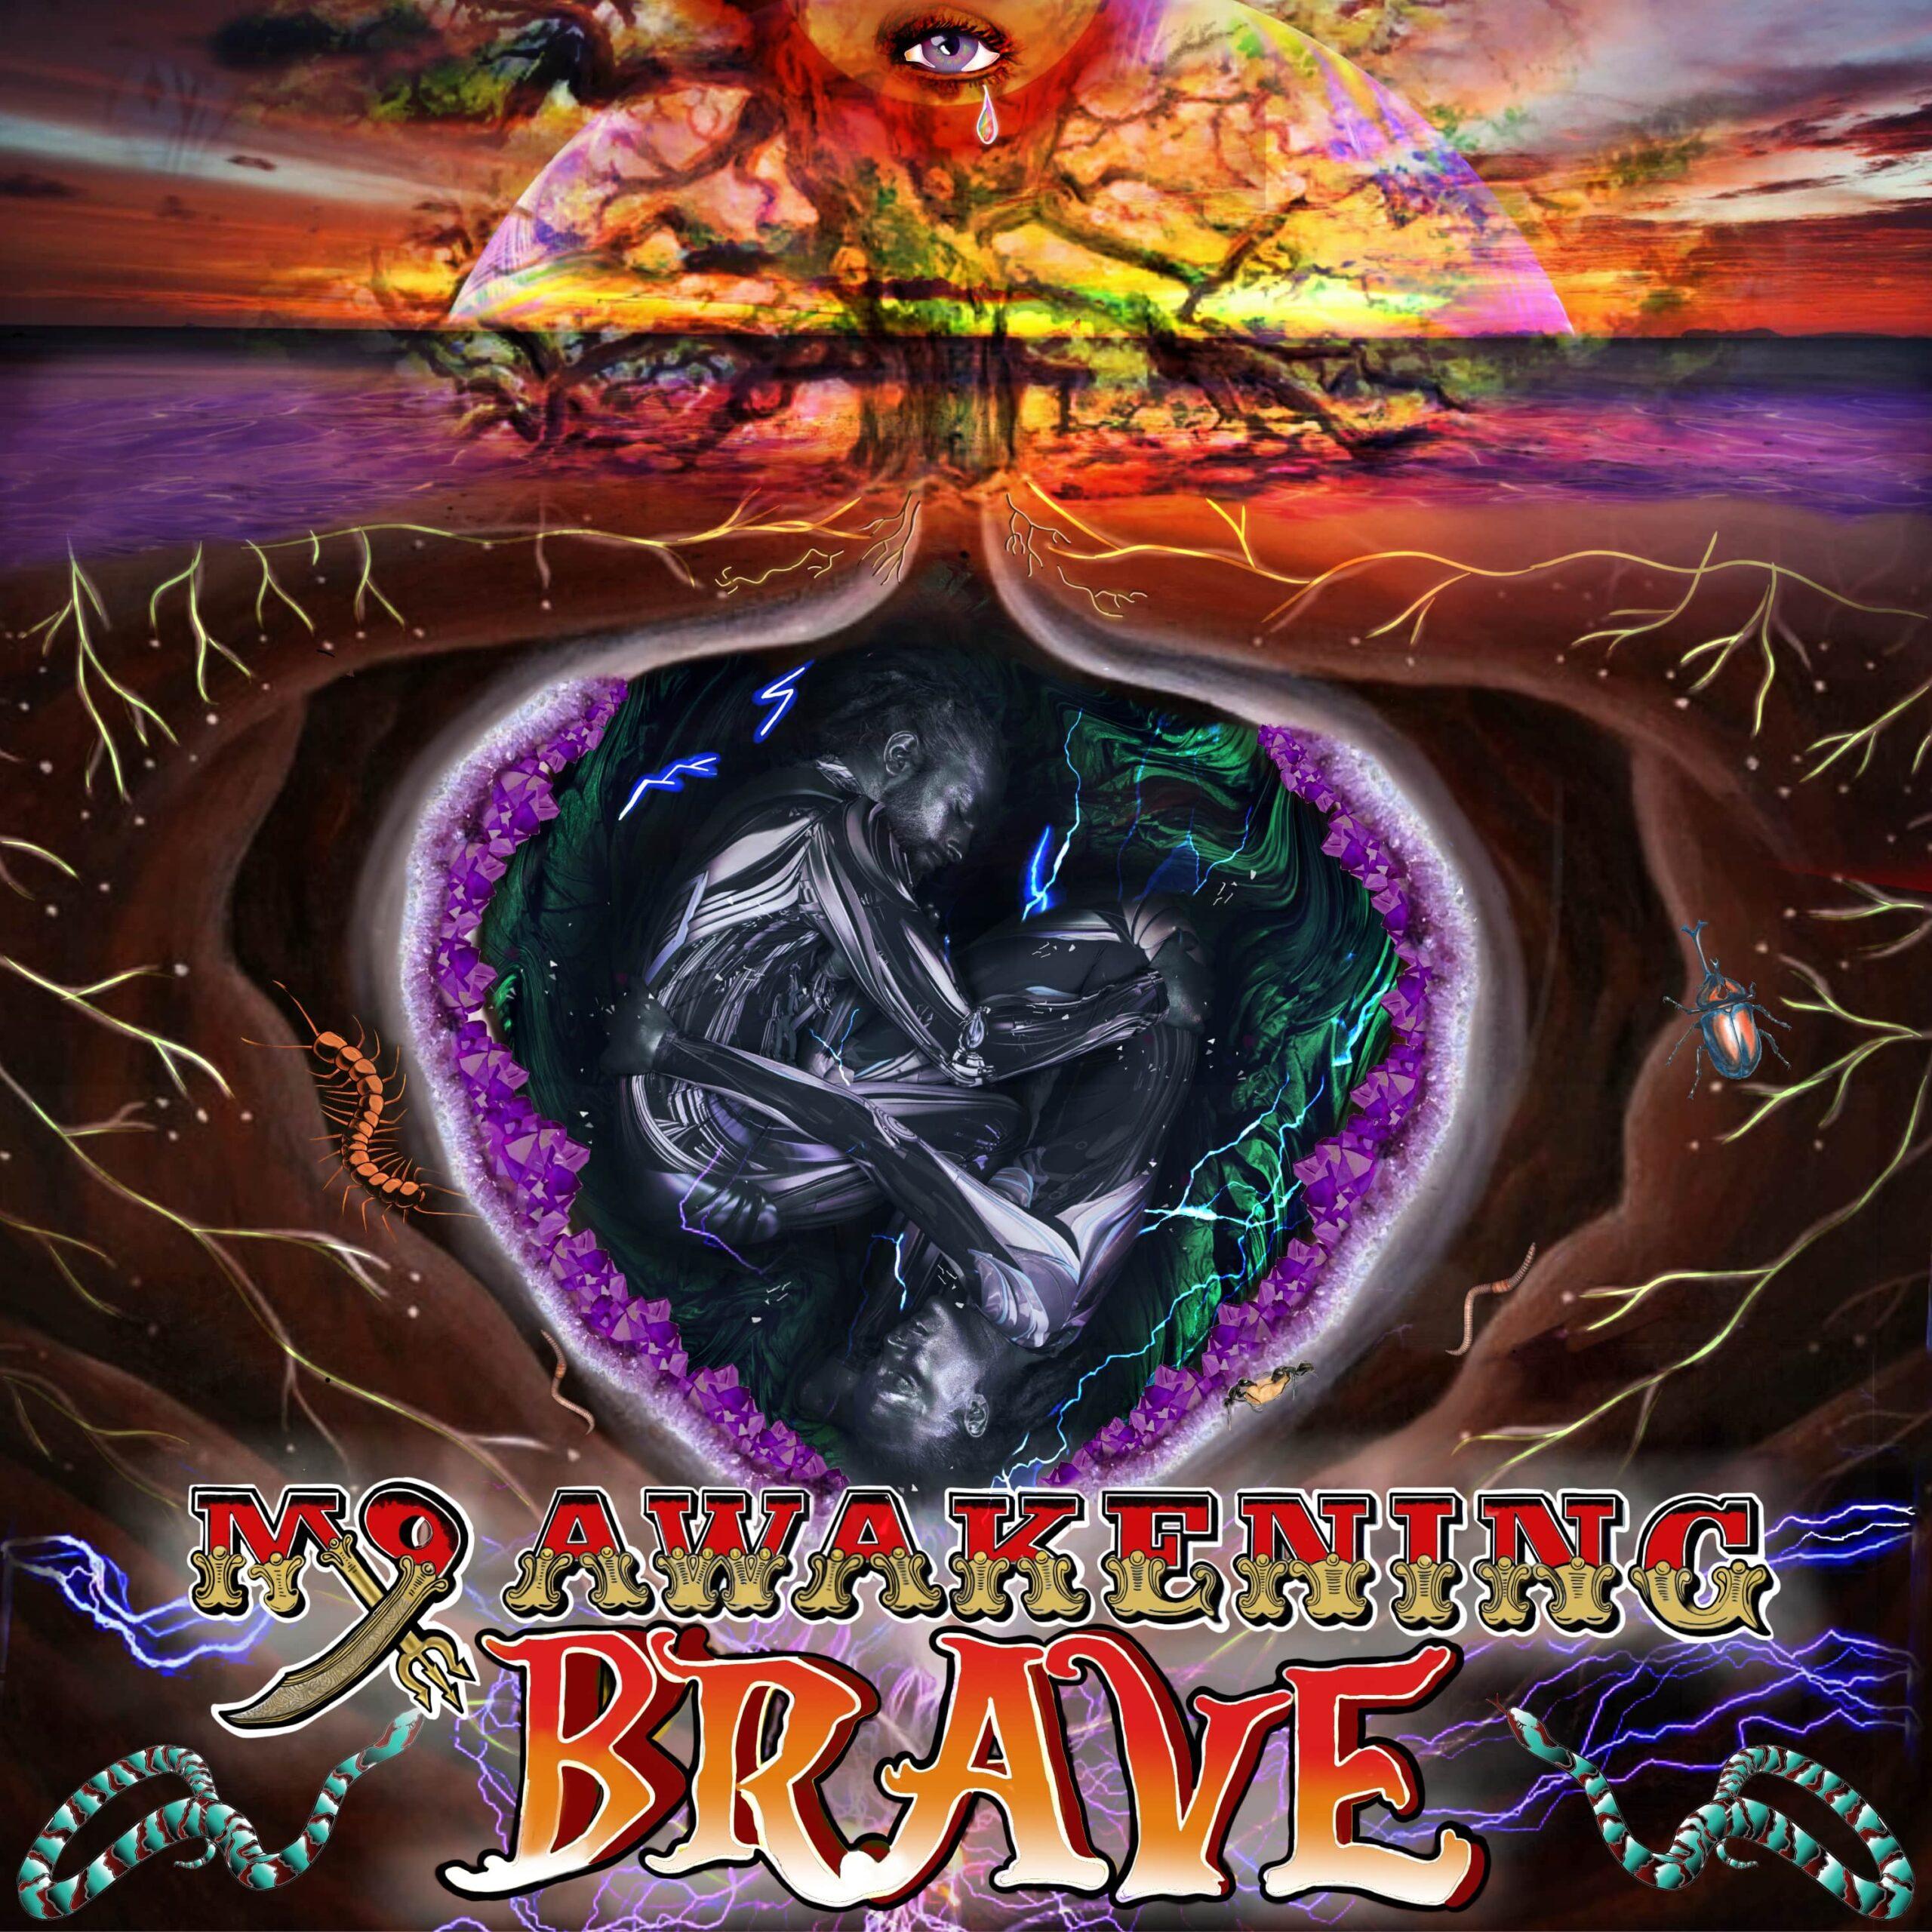 m9 awakening brave cover final